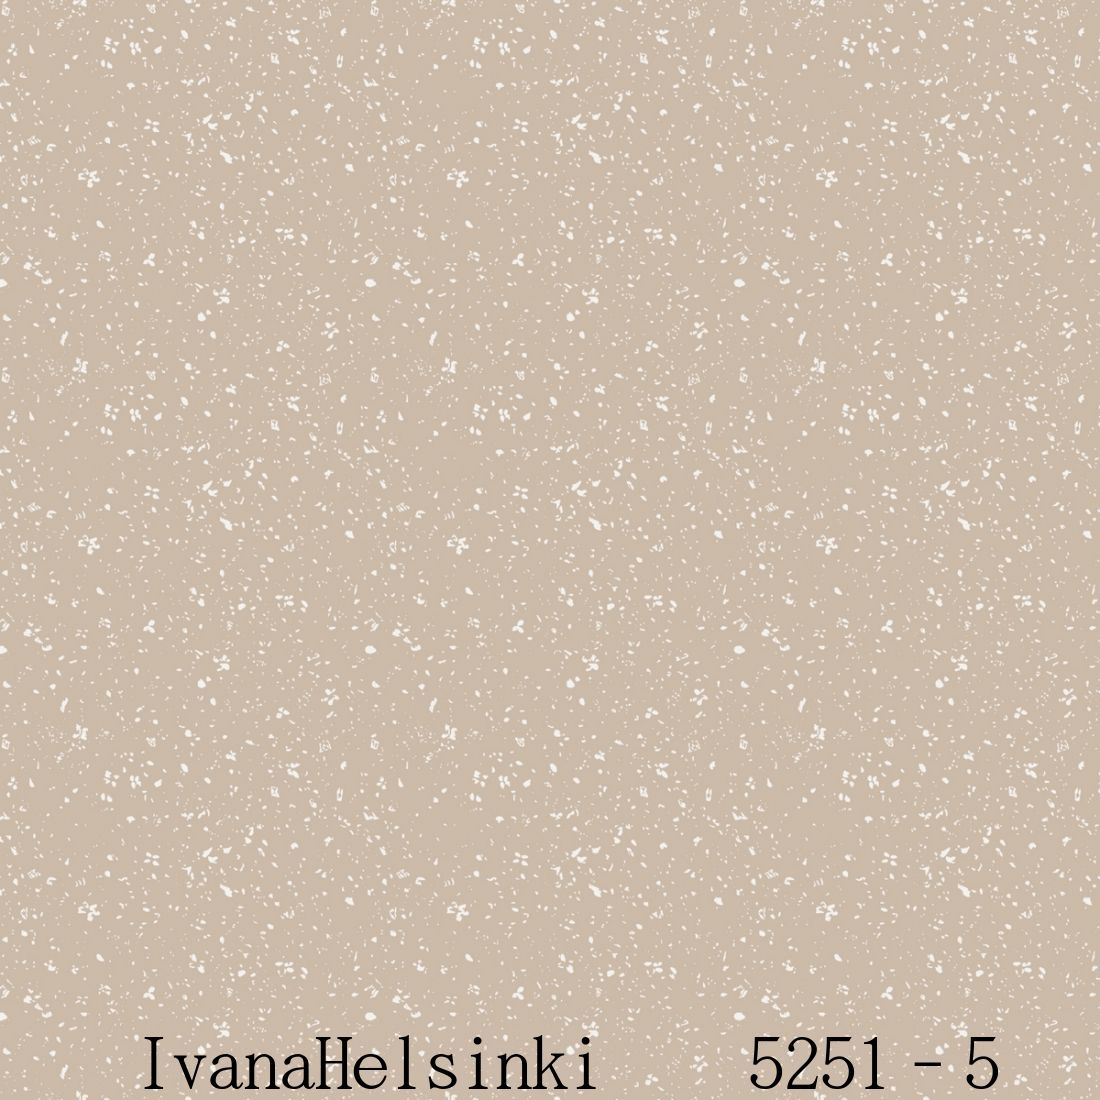 IvanaHelsinki イヴァナヘルシンキフィンランド製 壁紙5251-5【 53cm幅×10m巻 】裏面:フリース素材スプラッター柄 北欧 自然 ベージュ輸入壁紙IvanaHelsinki Wallpaper★P10倍★